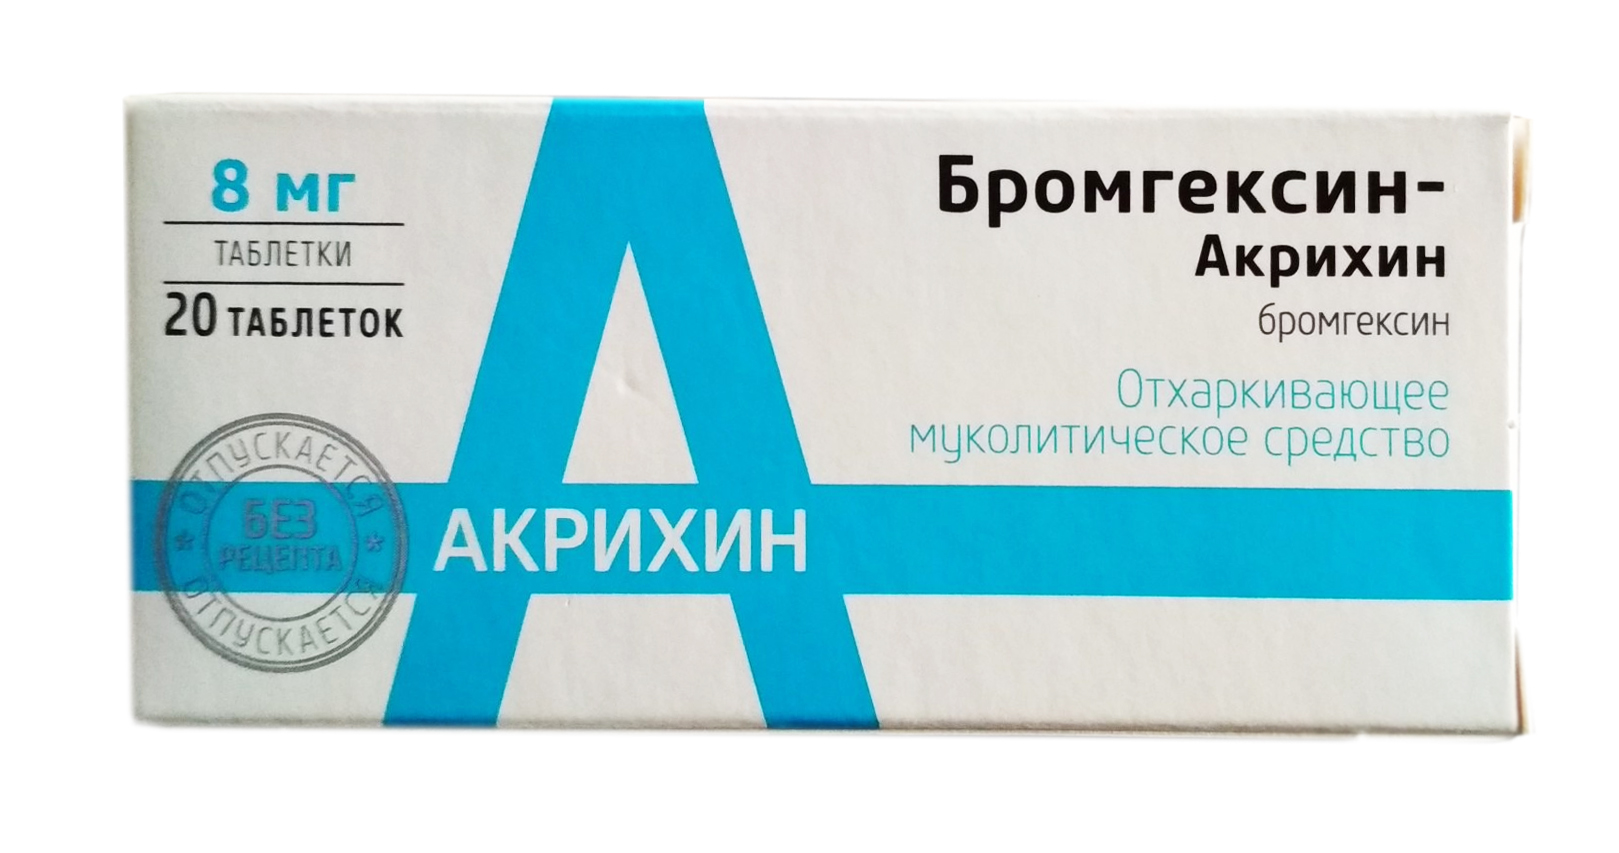 БРОМГЕКСИН- АКРИХИН таблетки 8 мг 20 шт.